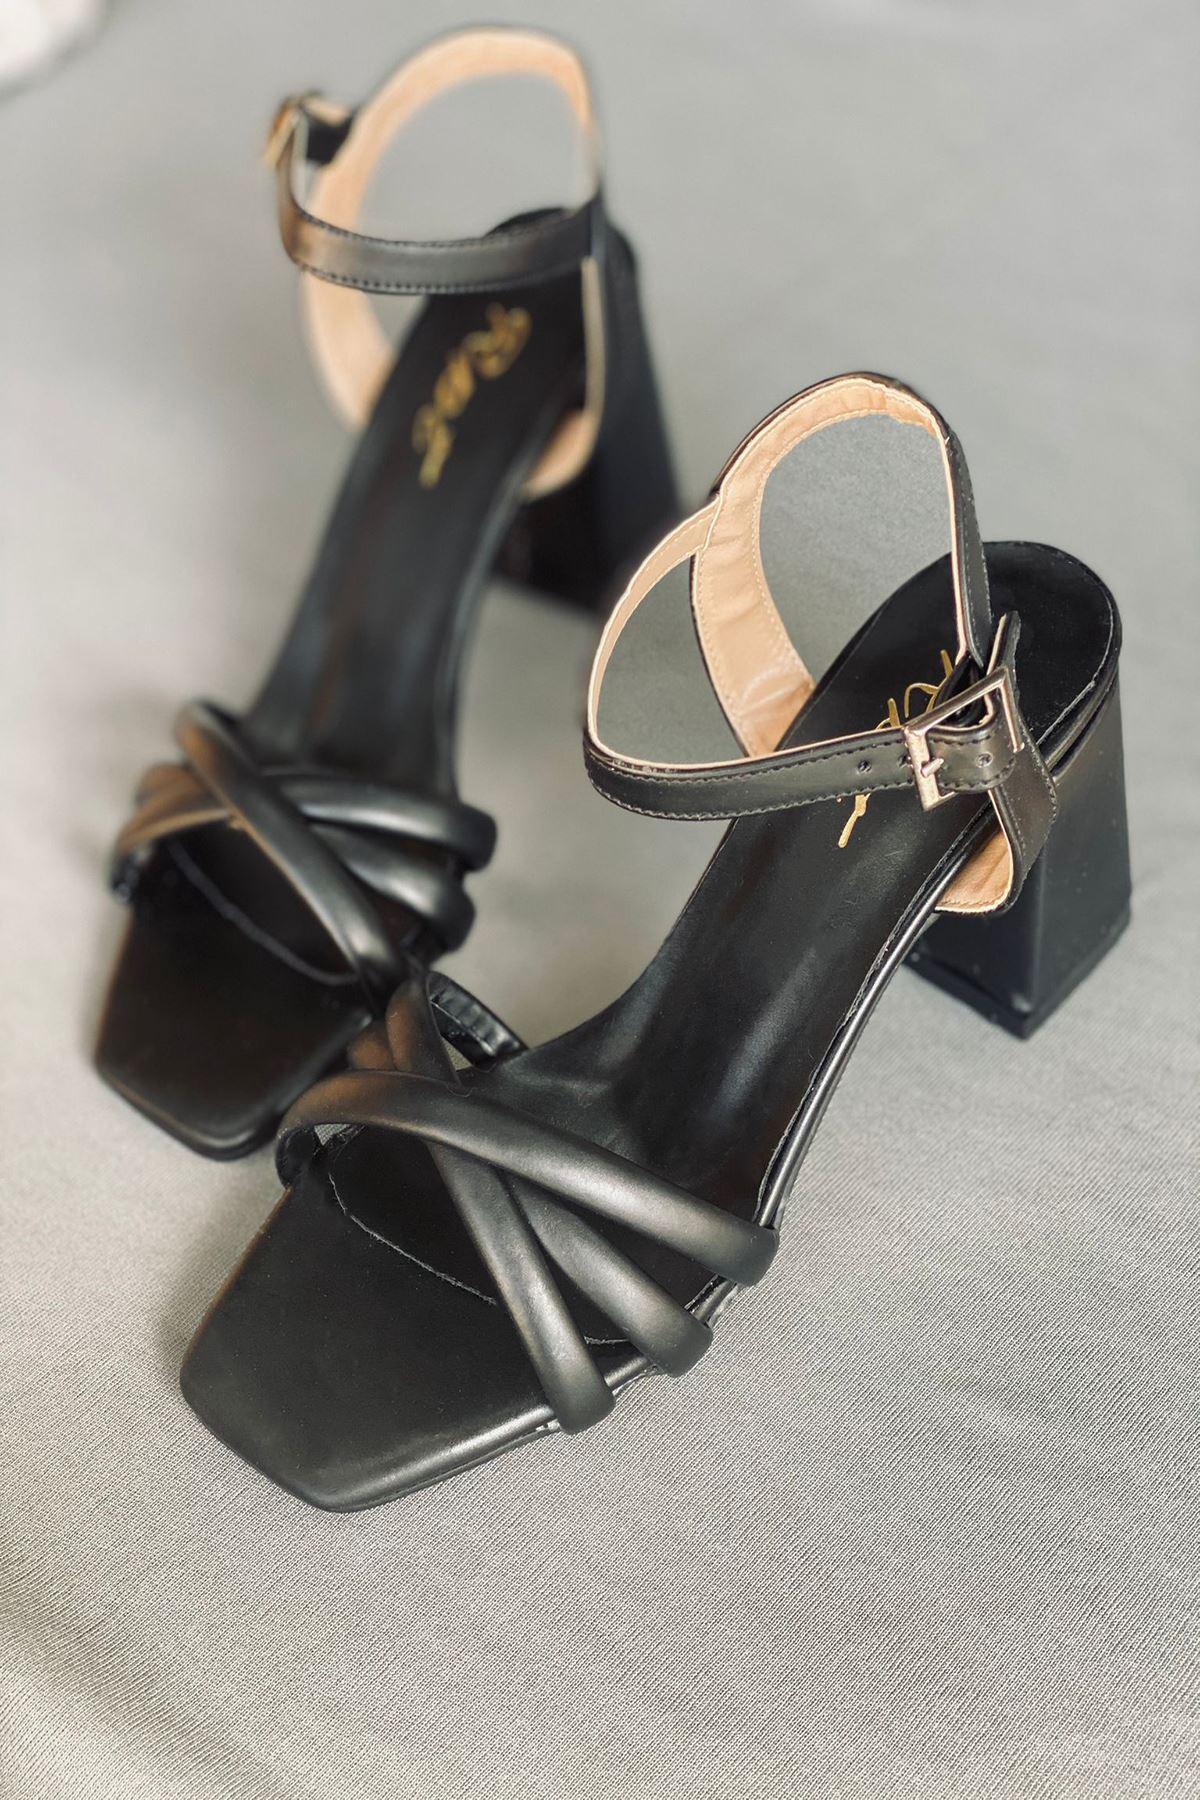 Y930 Siyah Deri Topuklu Ayakkabı